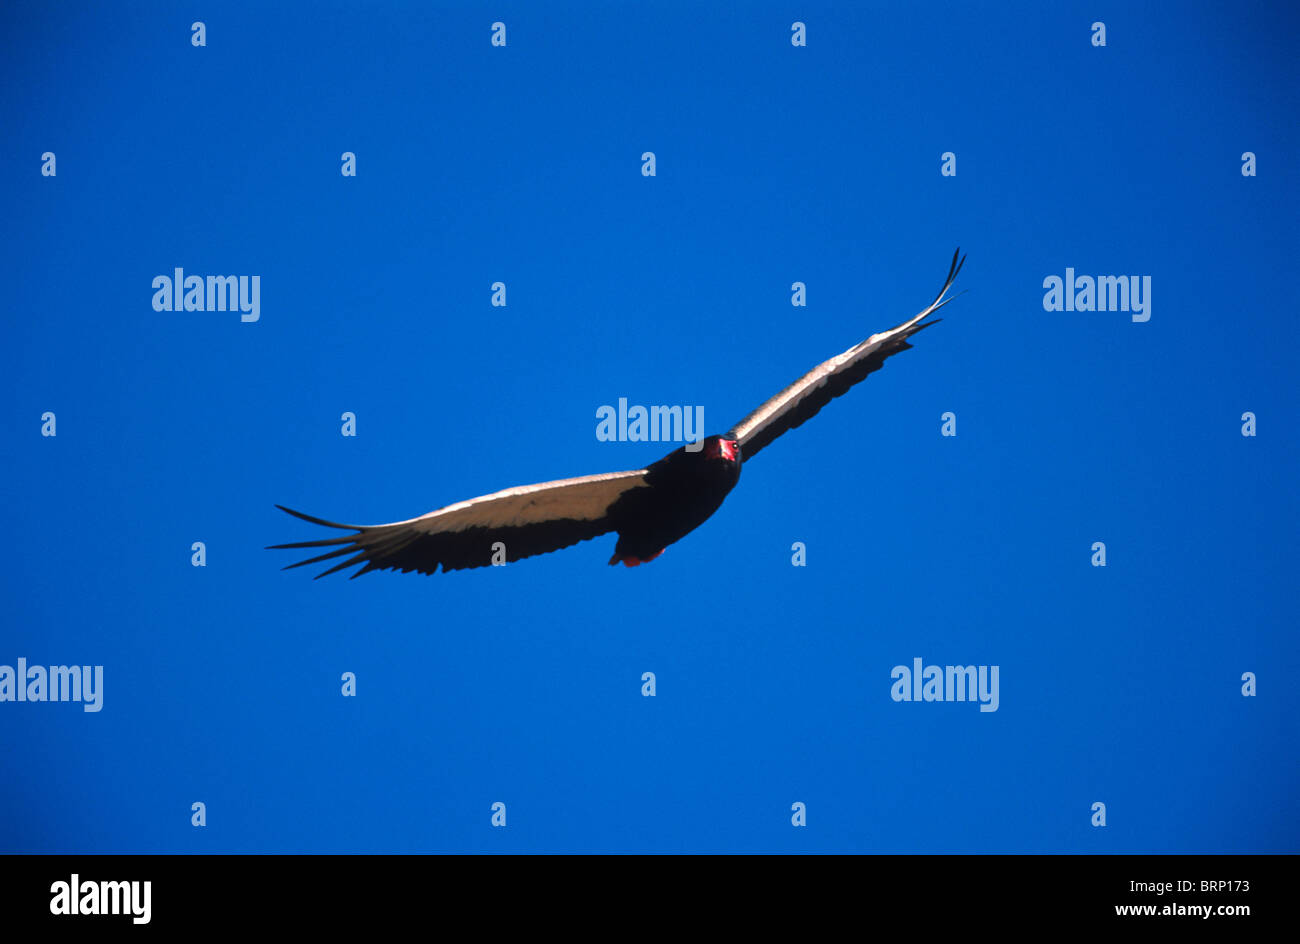 Bateleur in good colour, in-flight against vivid blue sky. - Stock Image